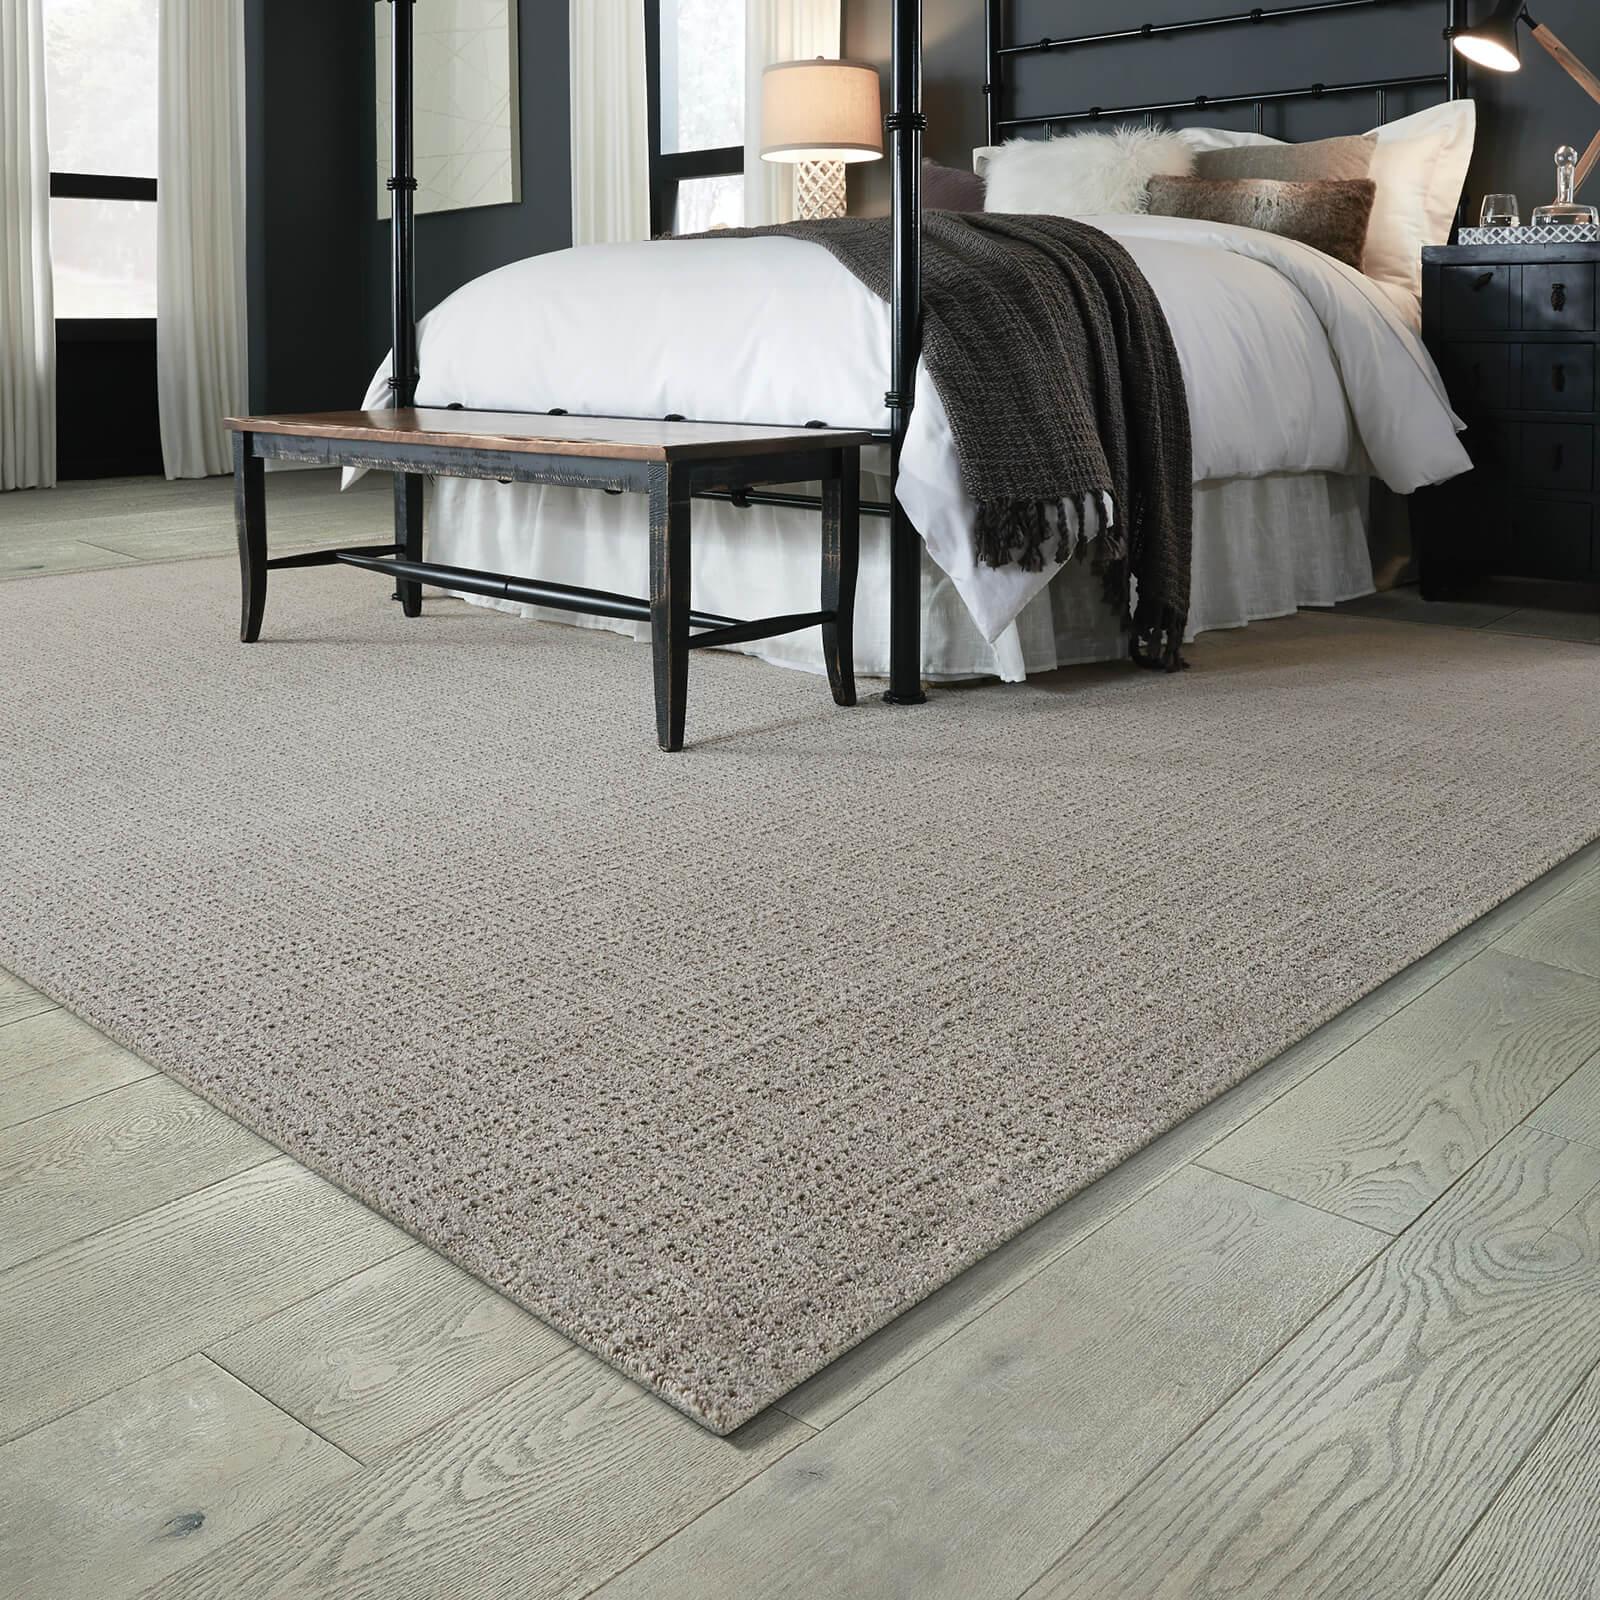 Spacious bedroom | Kirkland's Flooring